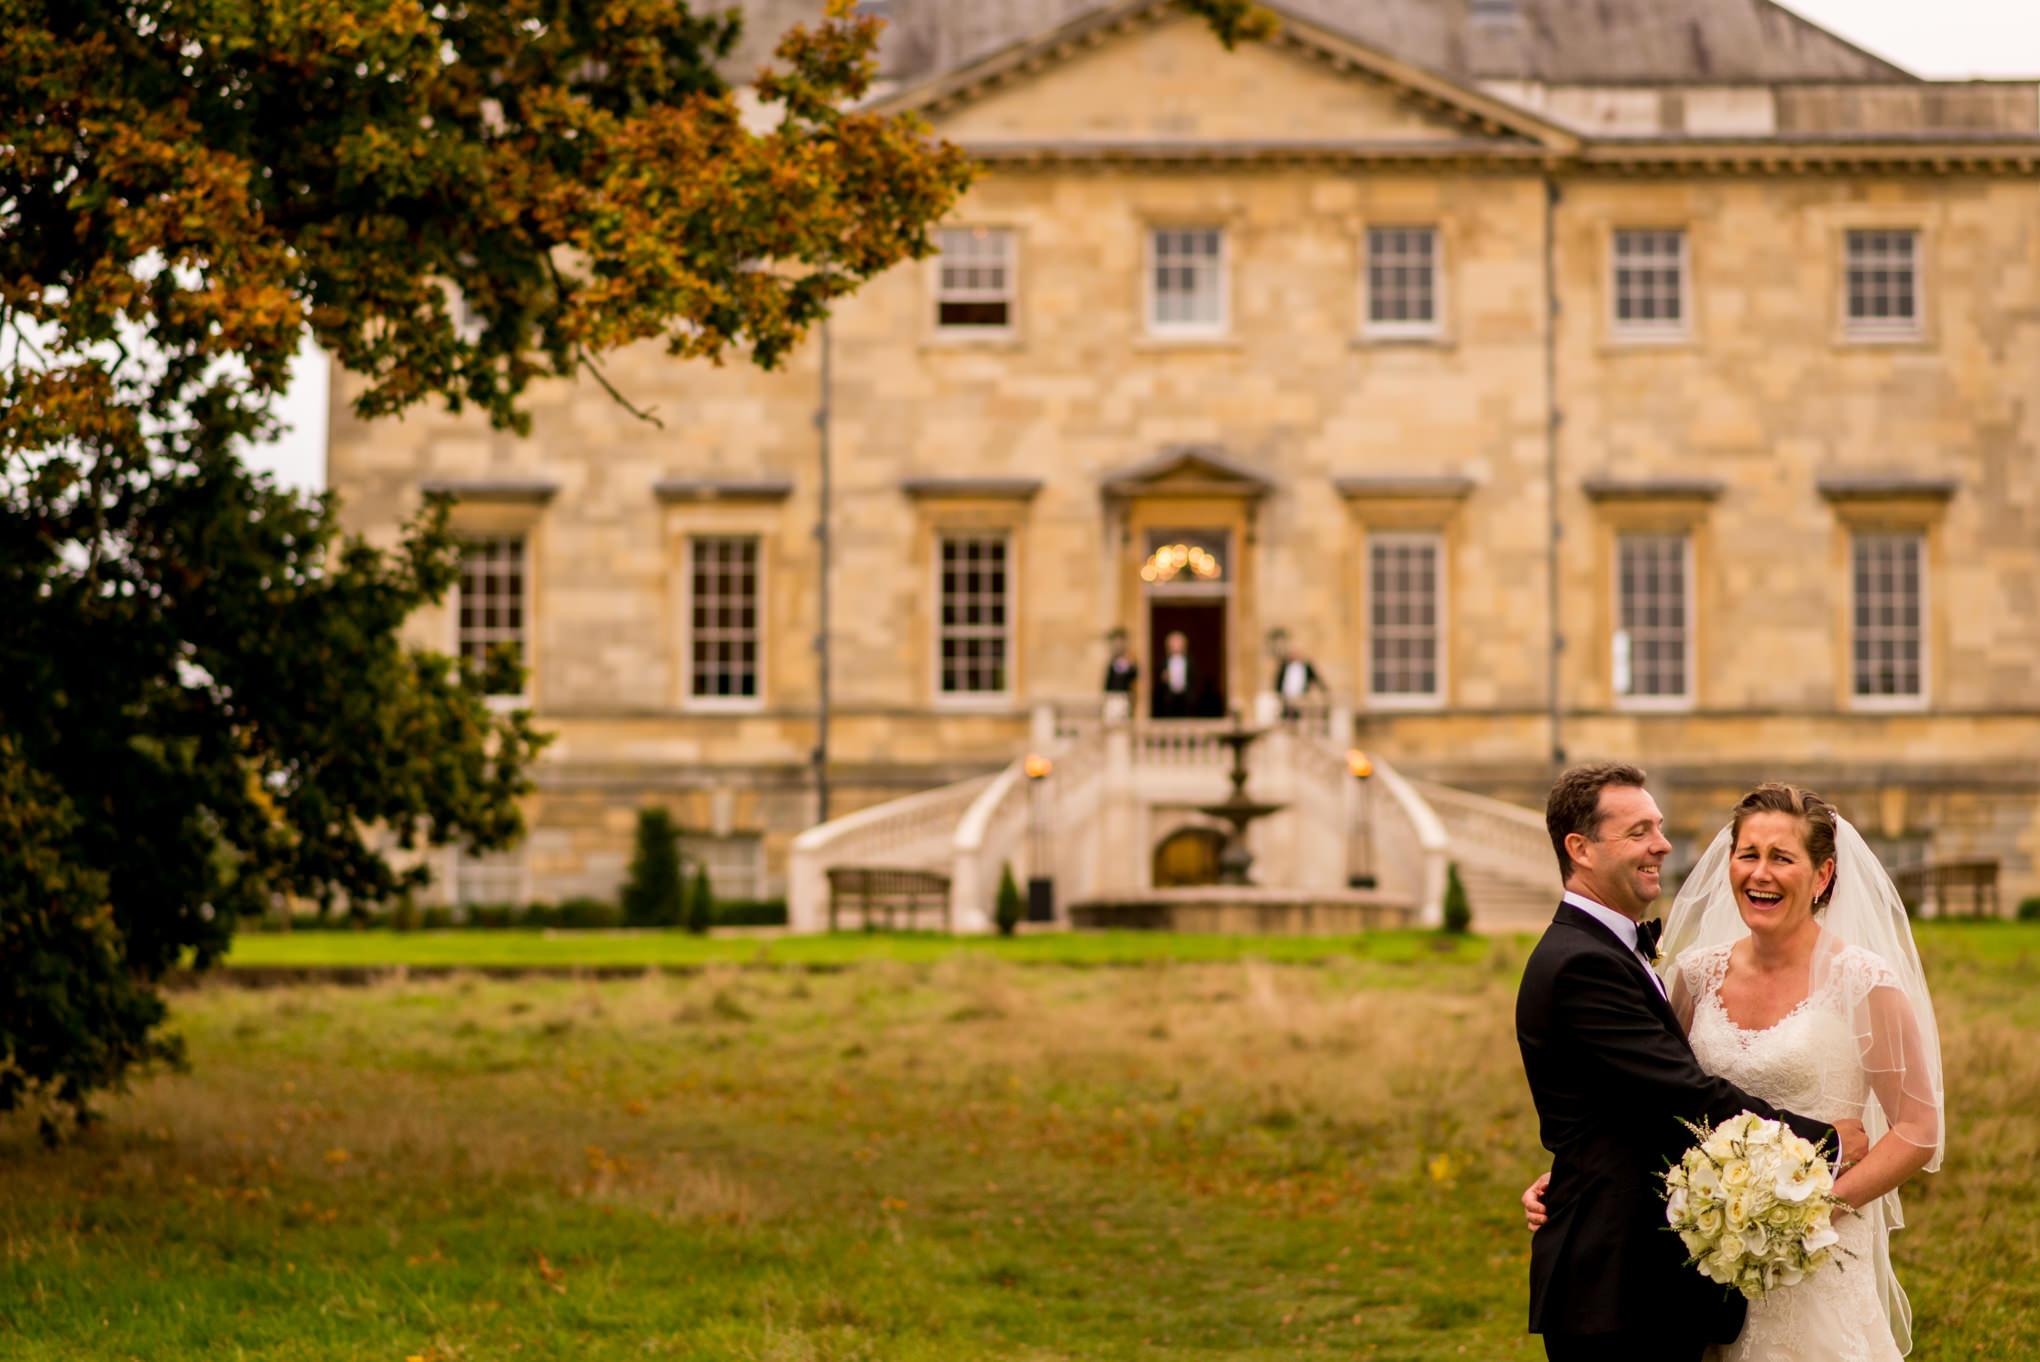 wedding at Botleys Mansion